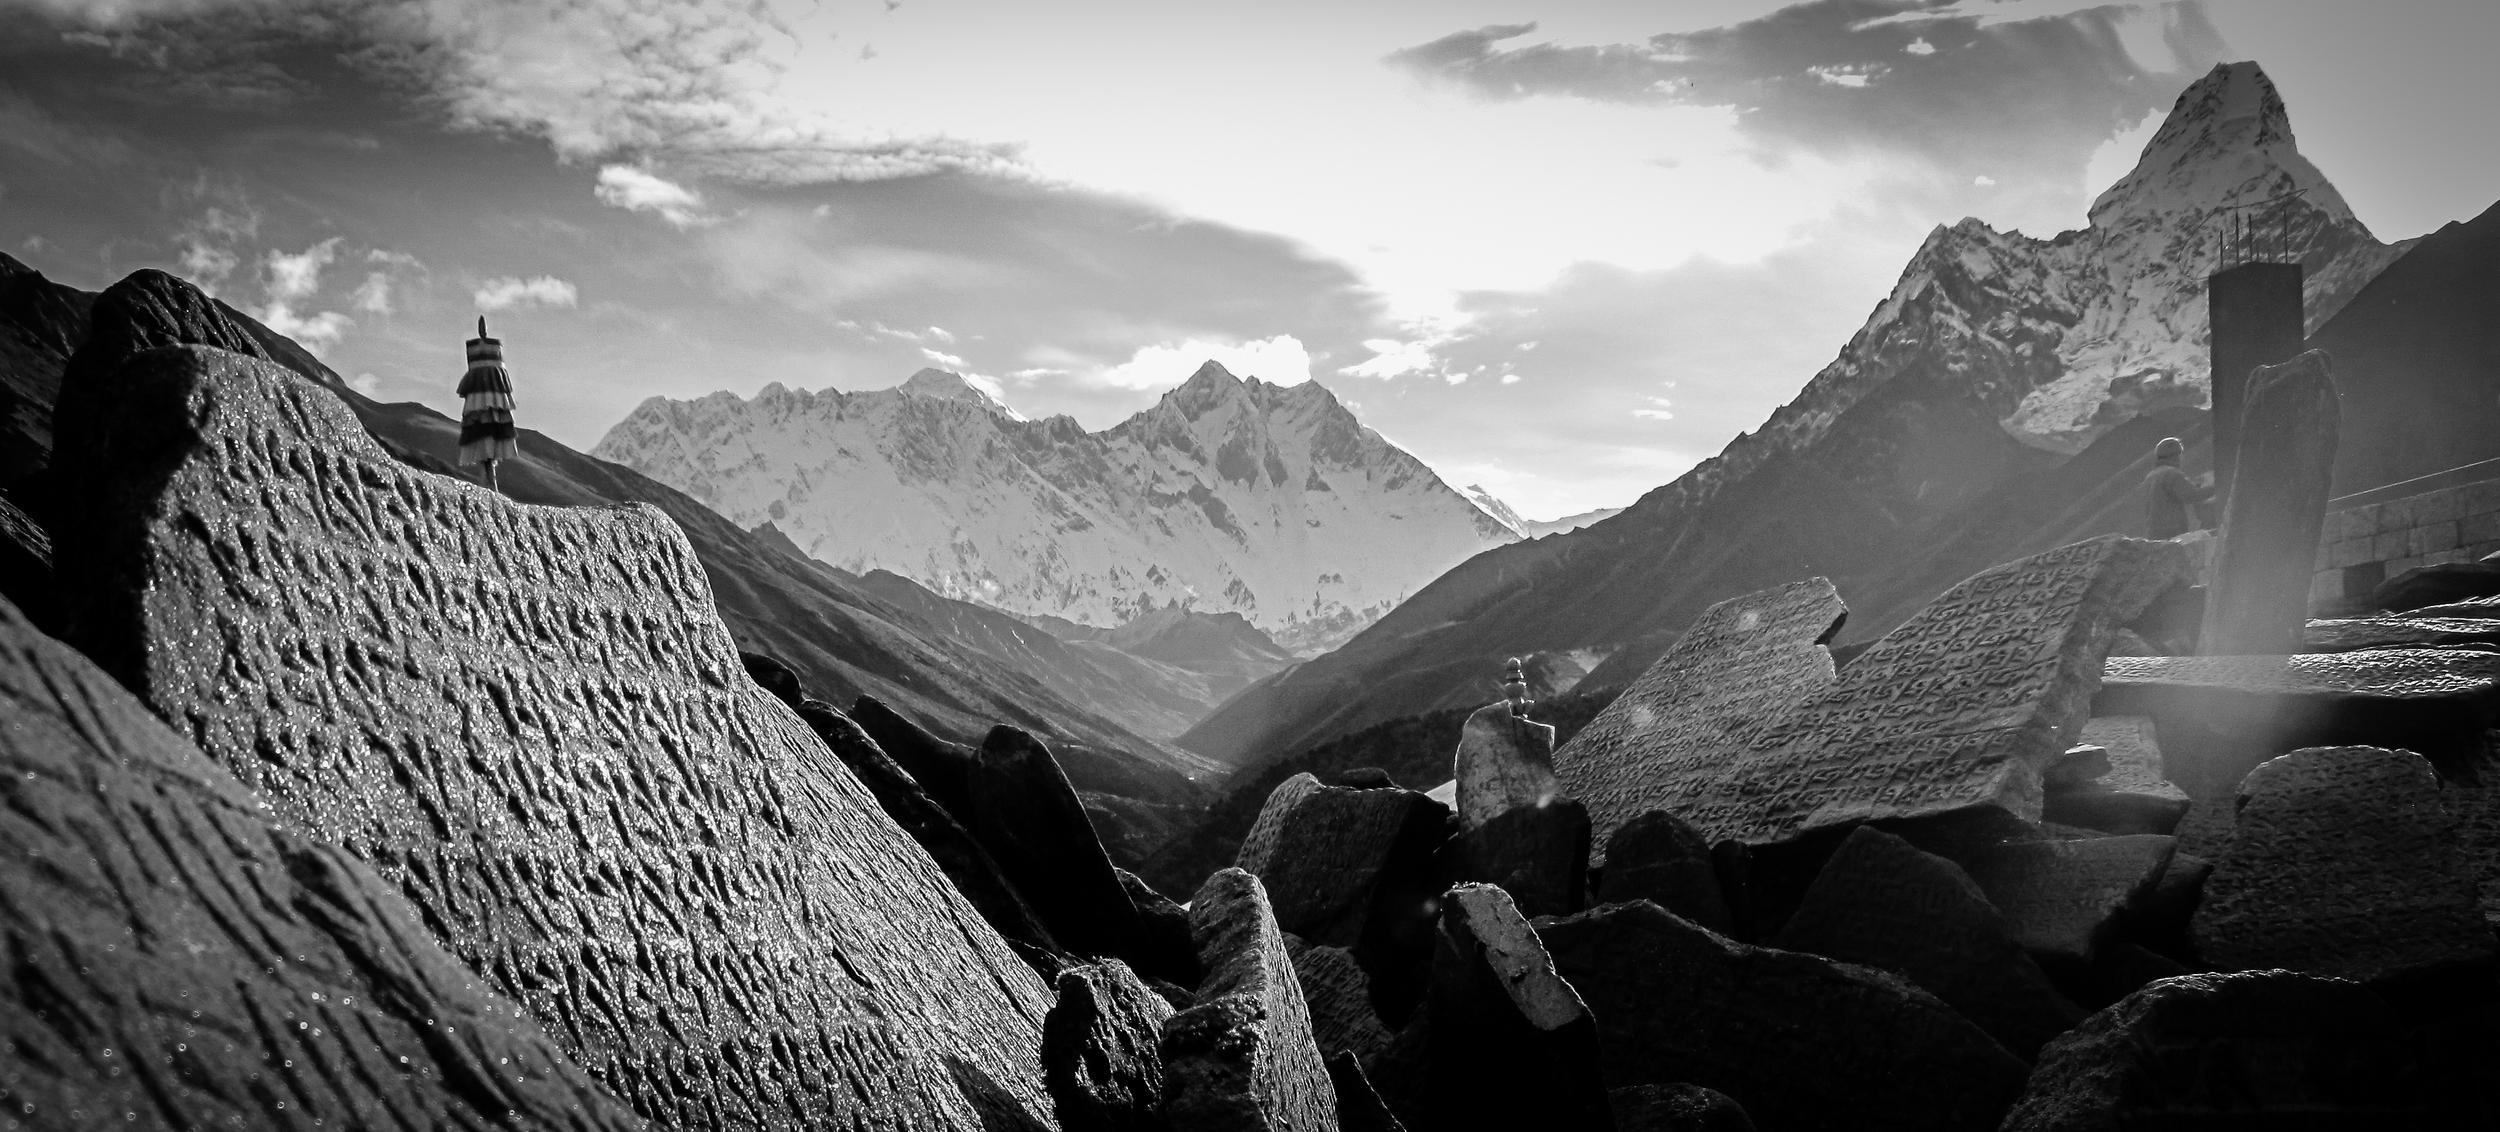 Sherpa script on stones below Mount Everest, Lhotse, and Ama Dablam, Nepal